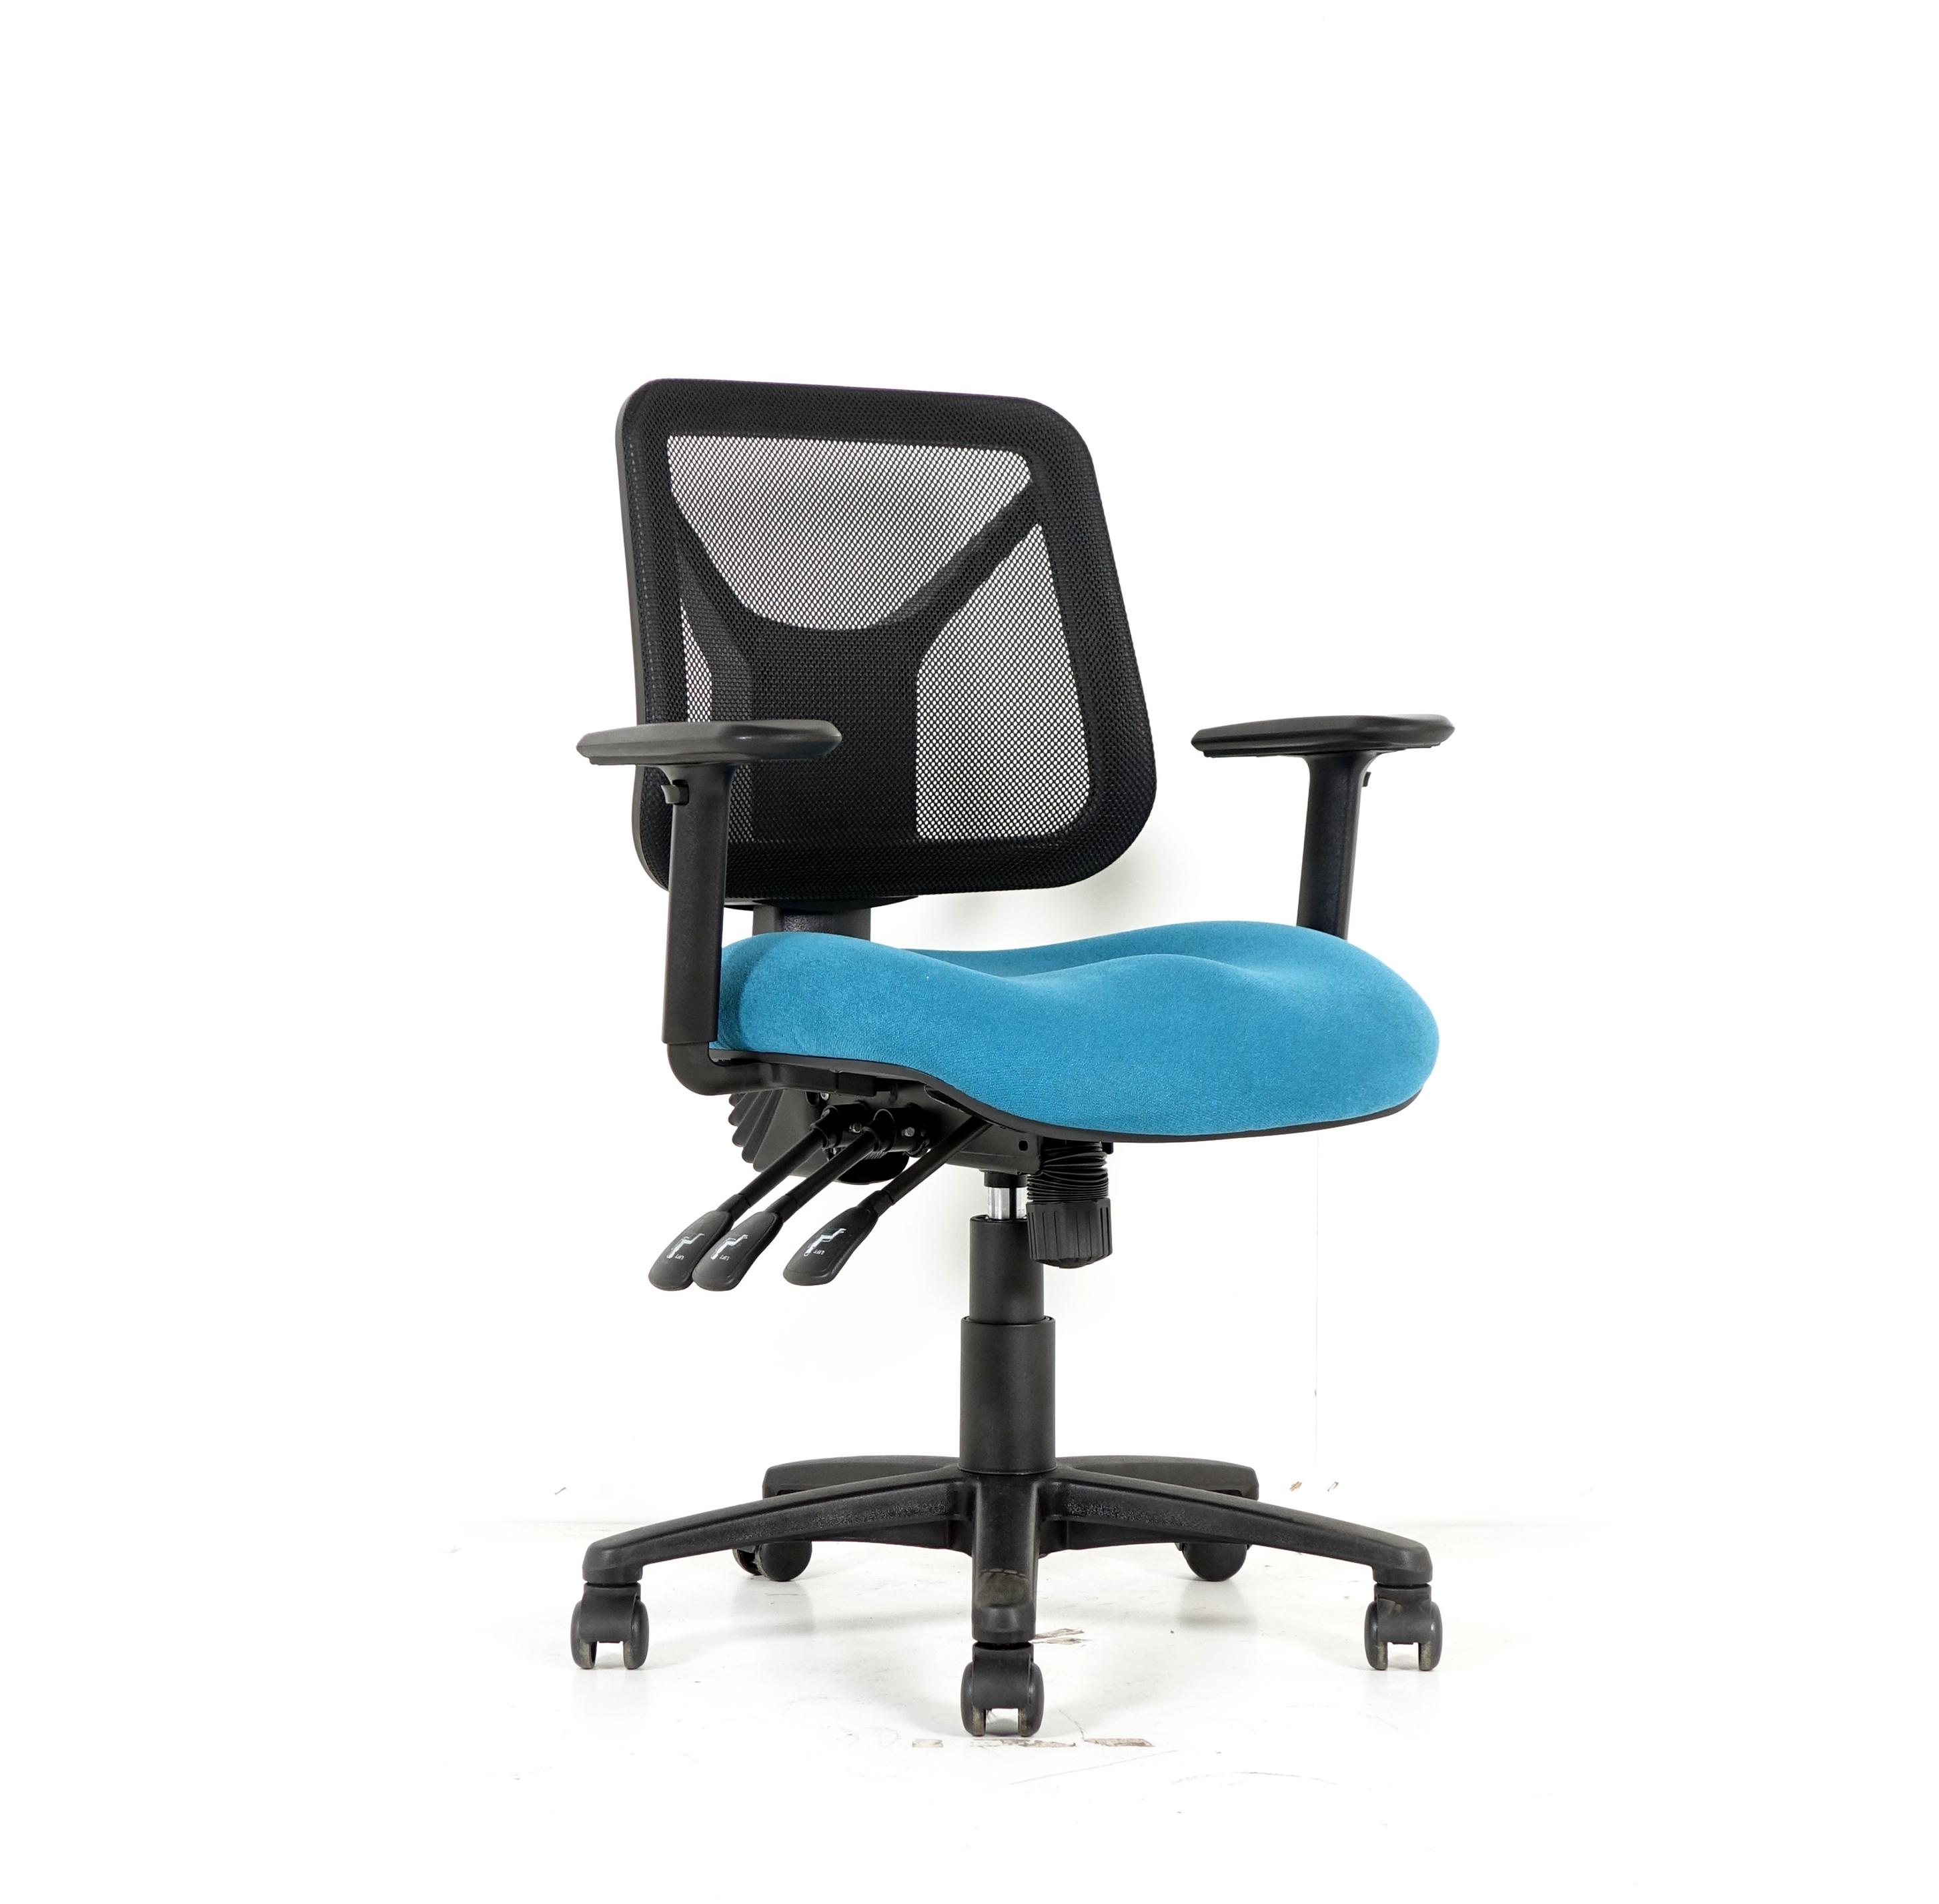 M80 Medium Back Clerical Chair